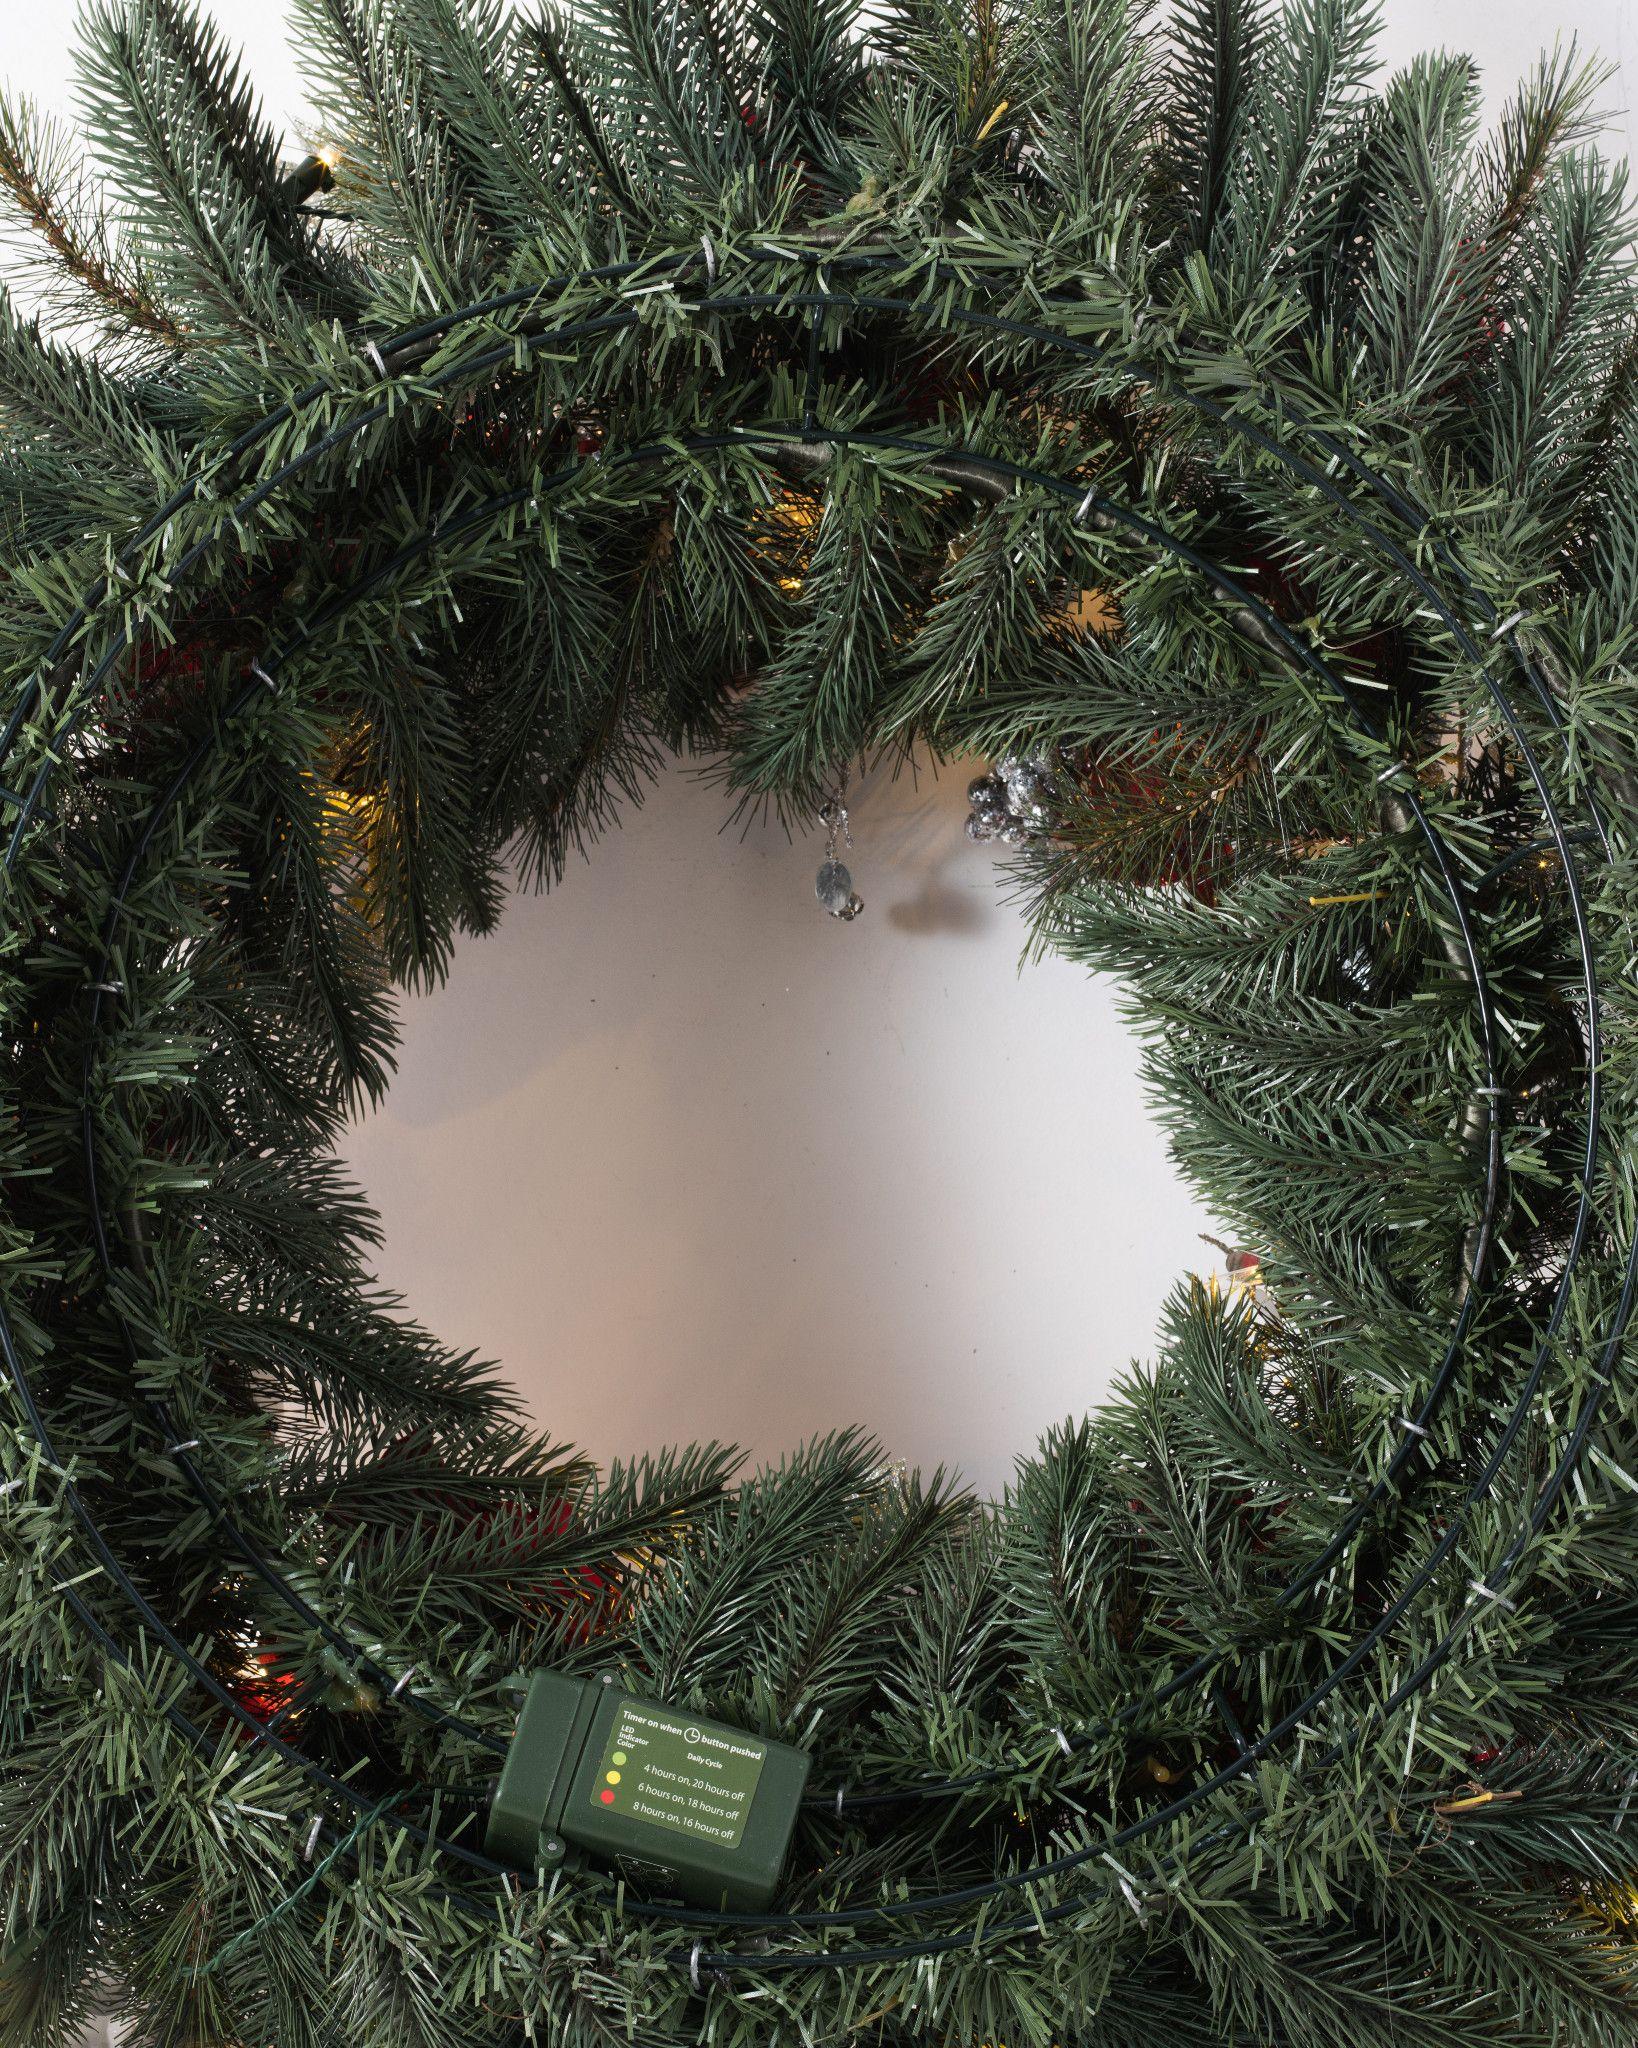 silver bells wreath and garland balsam hill uk